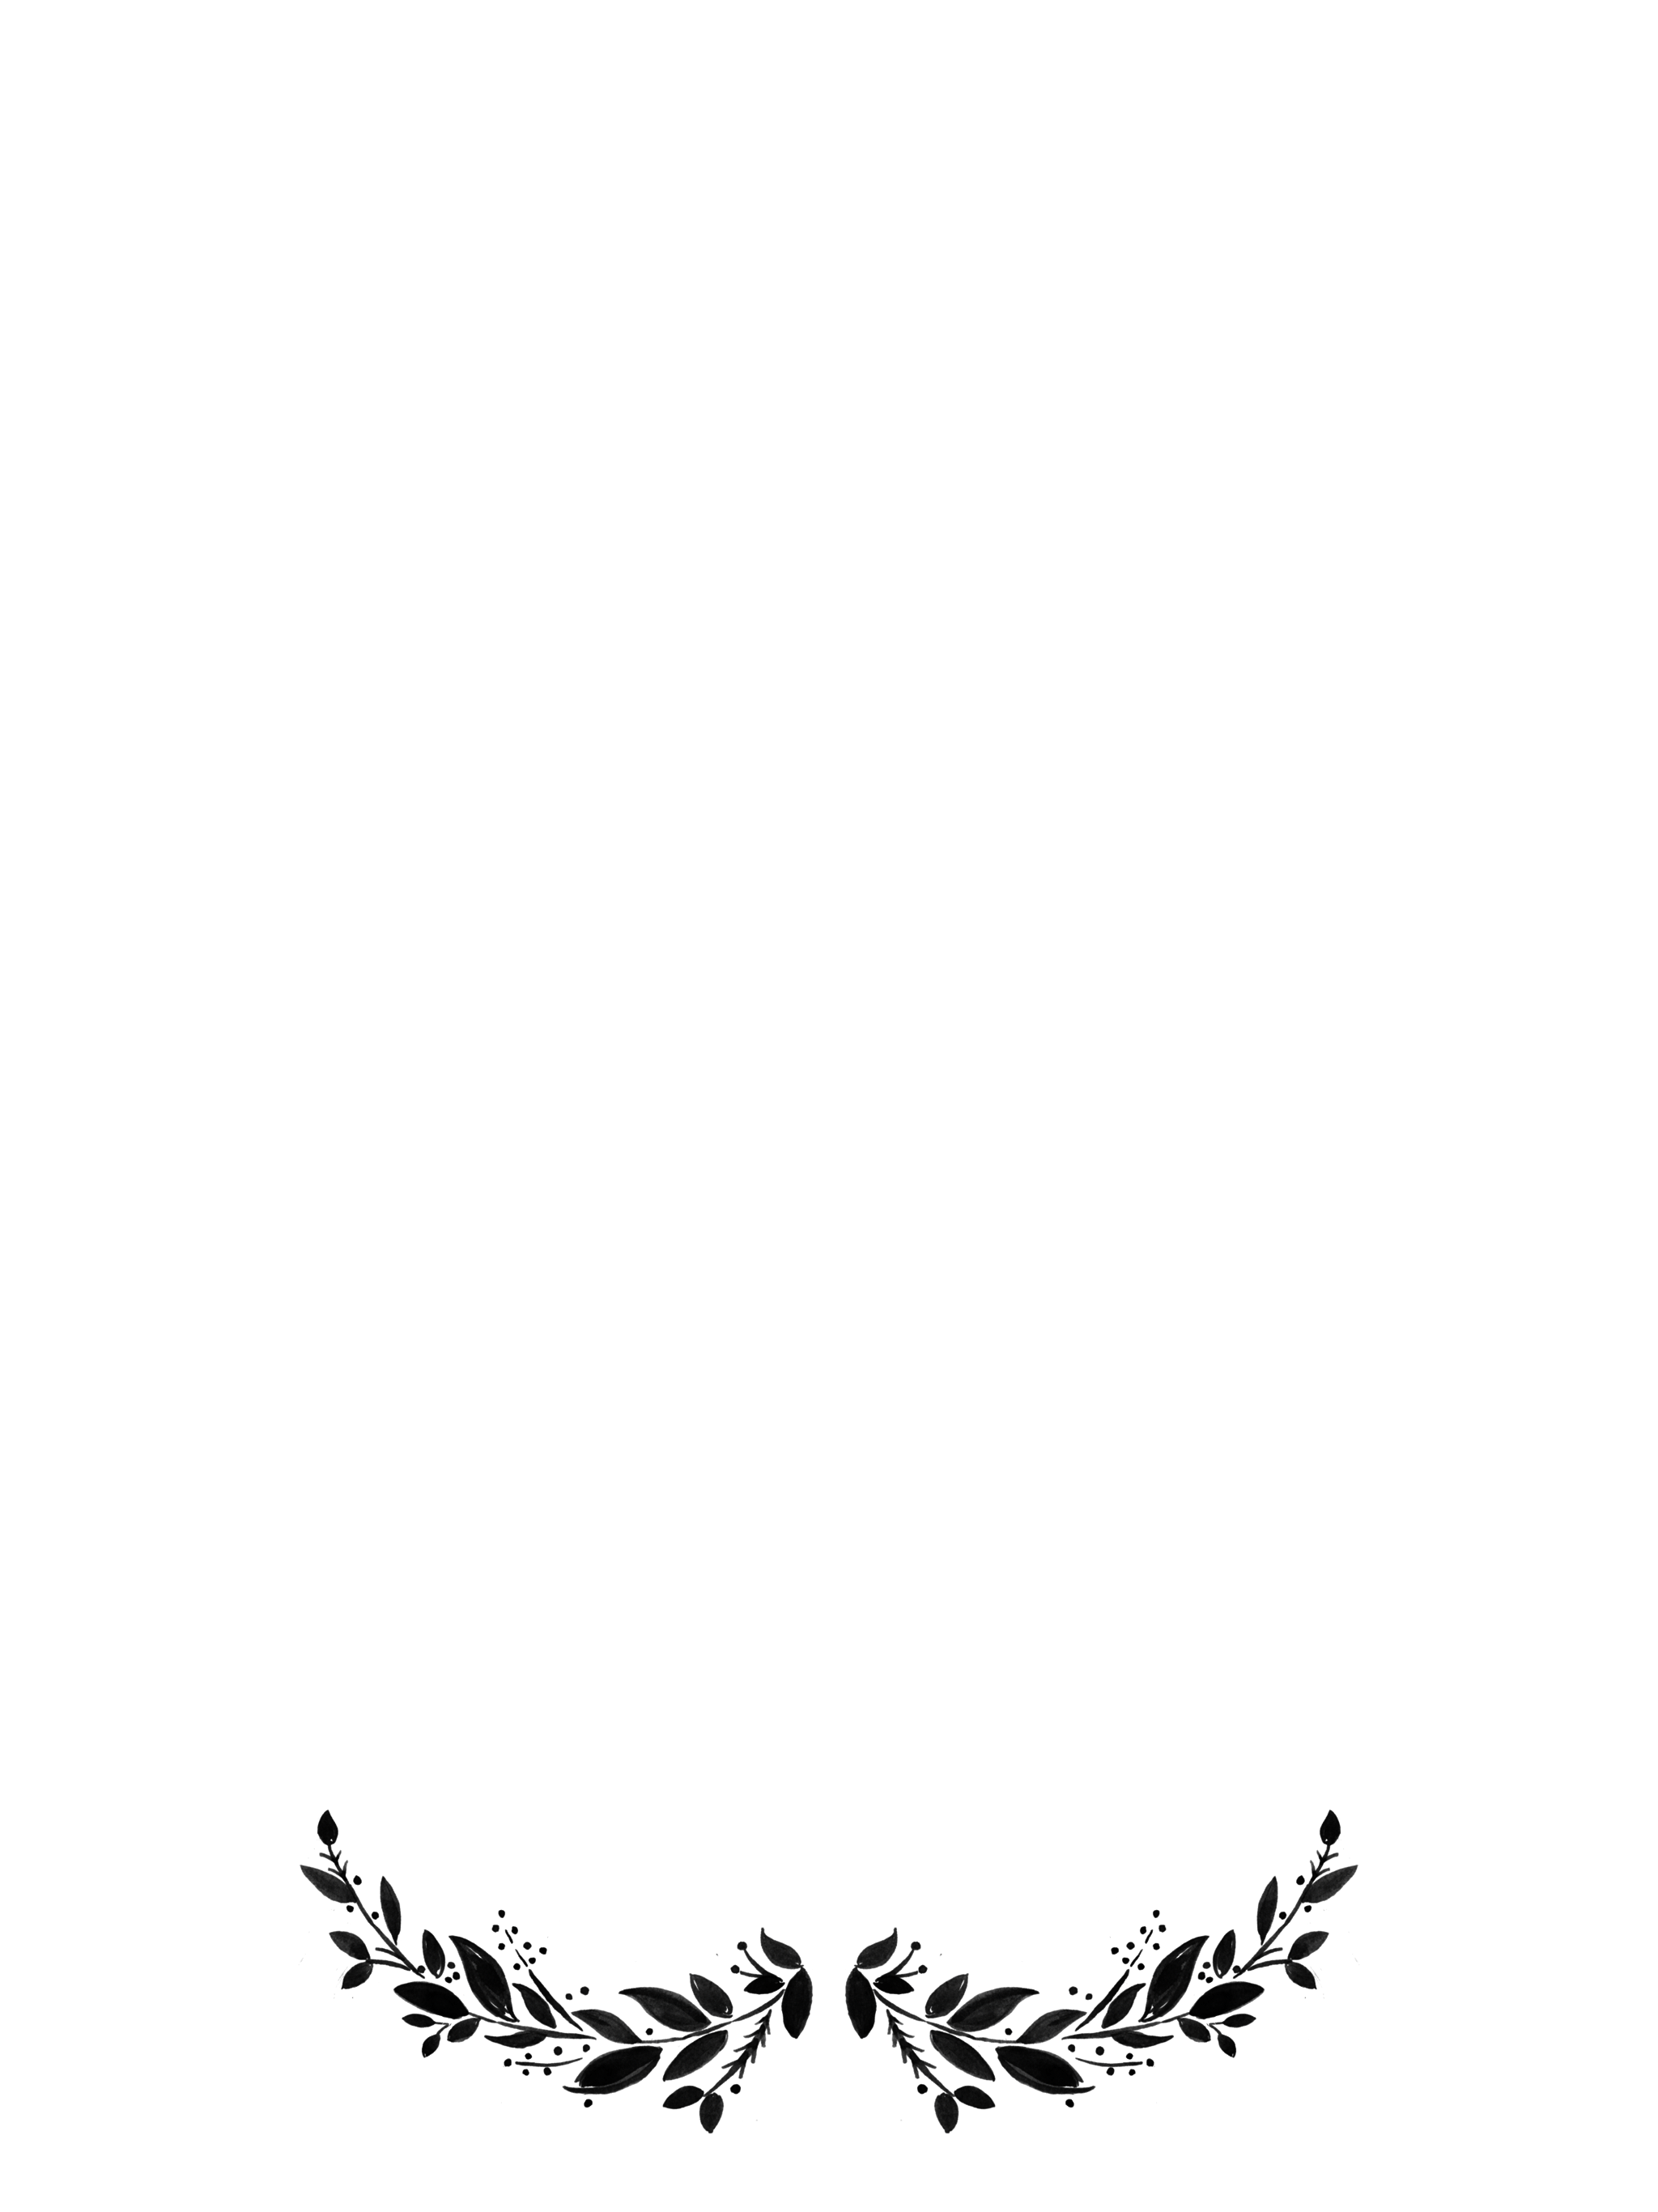 Ipad Vertical_2048x2732_Wreath_Black.png